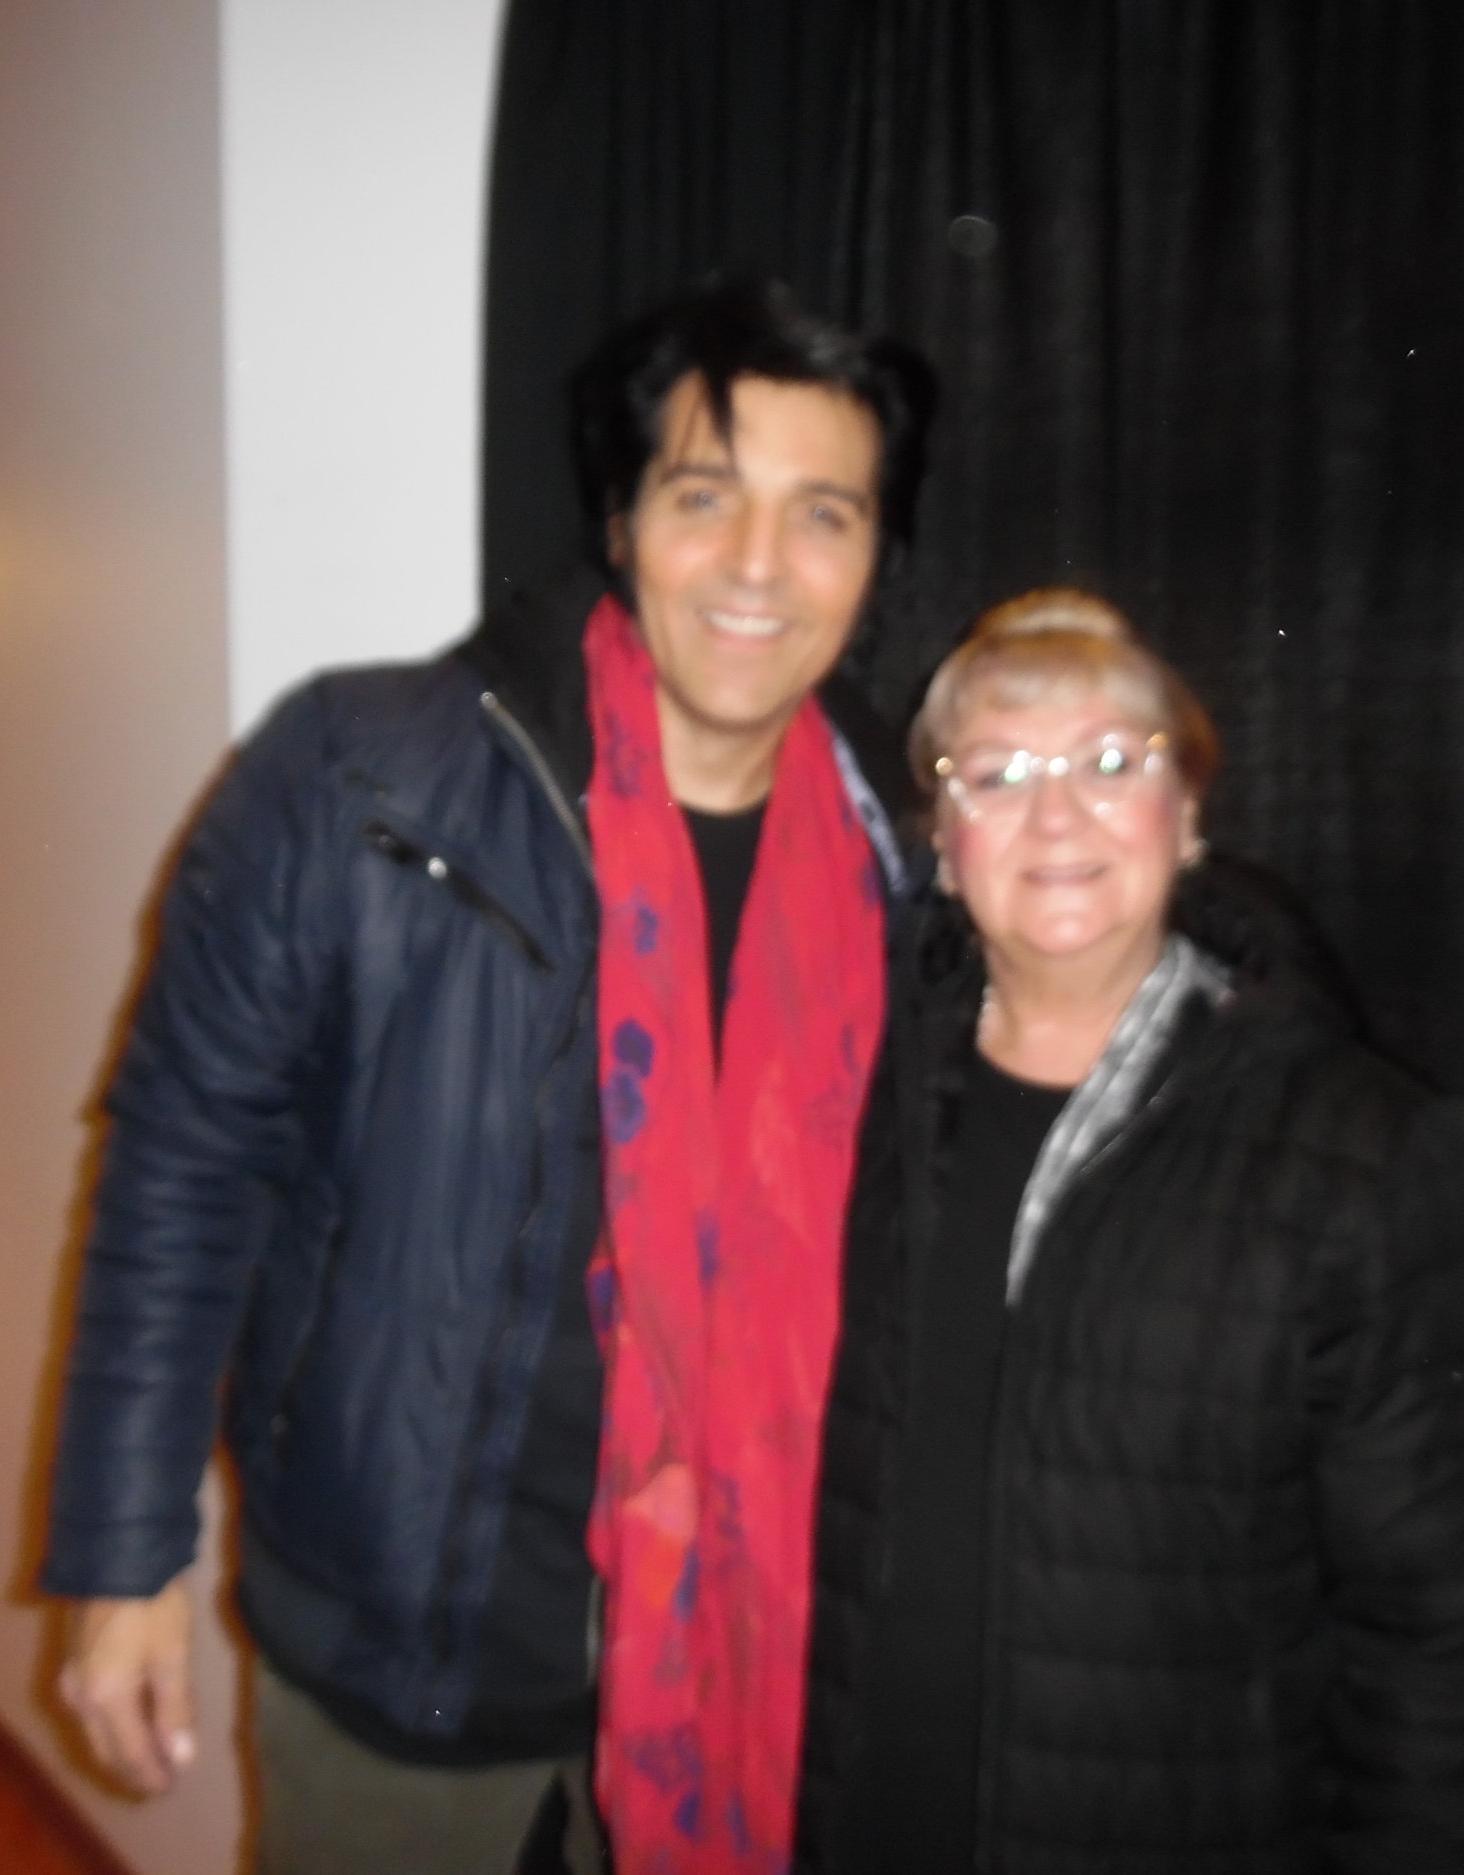 ETA  Steve Michaels  and Carolyn after concert at Mohawk Raceway, December 3rd, 2017.